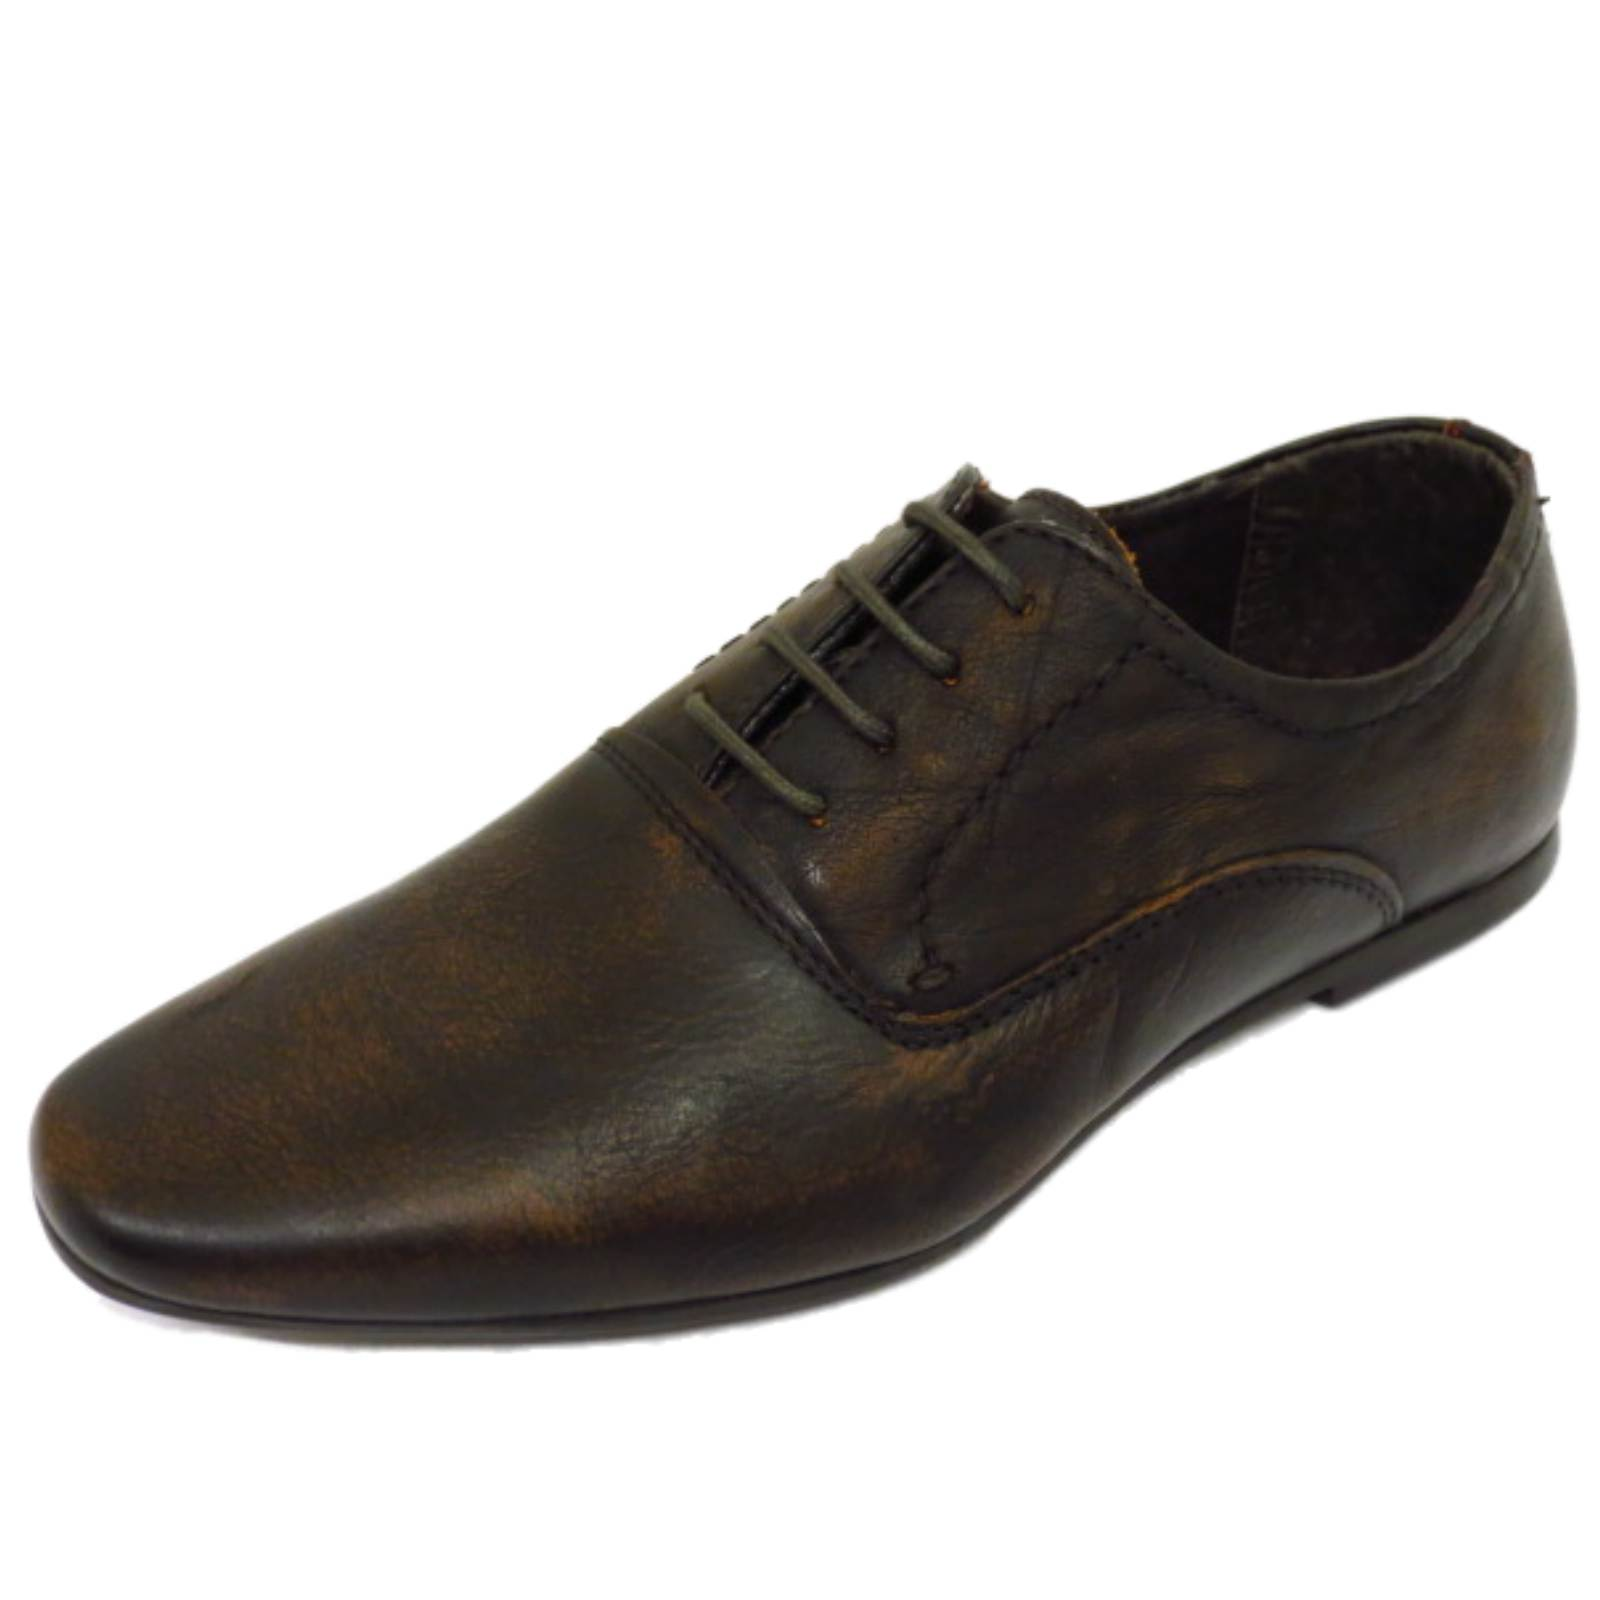 Childrens Wedding Loafer Shoes